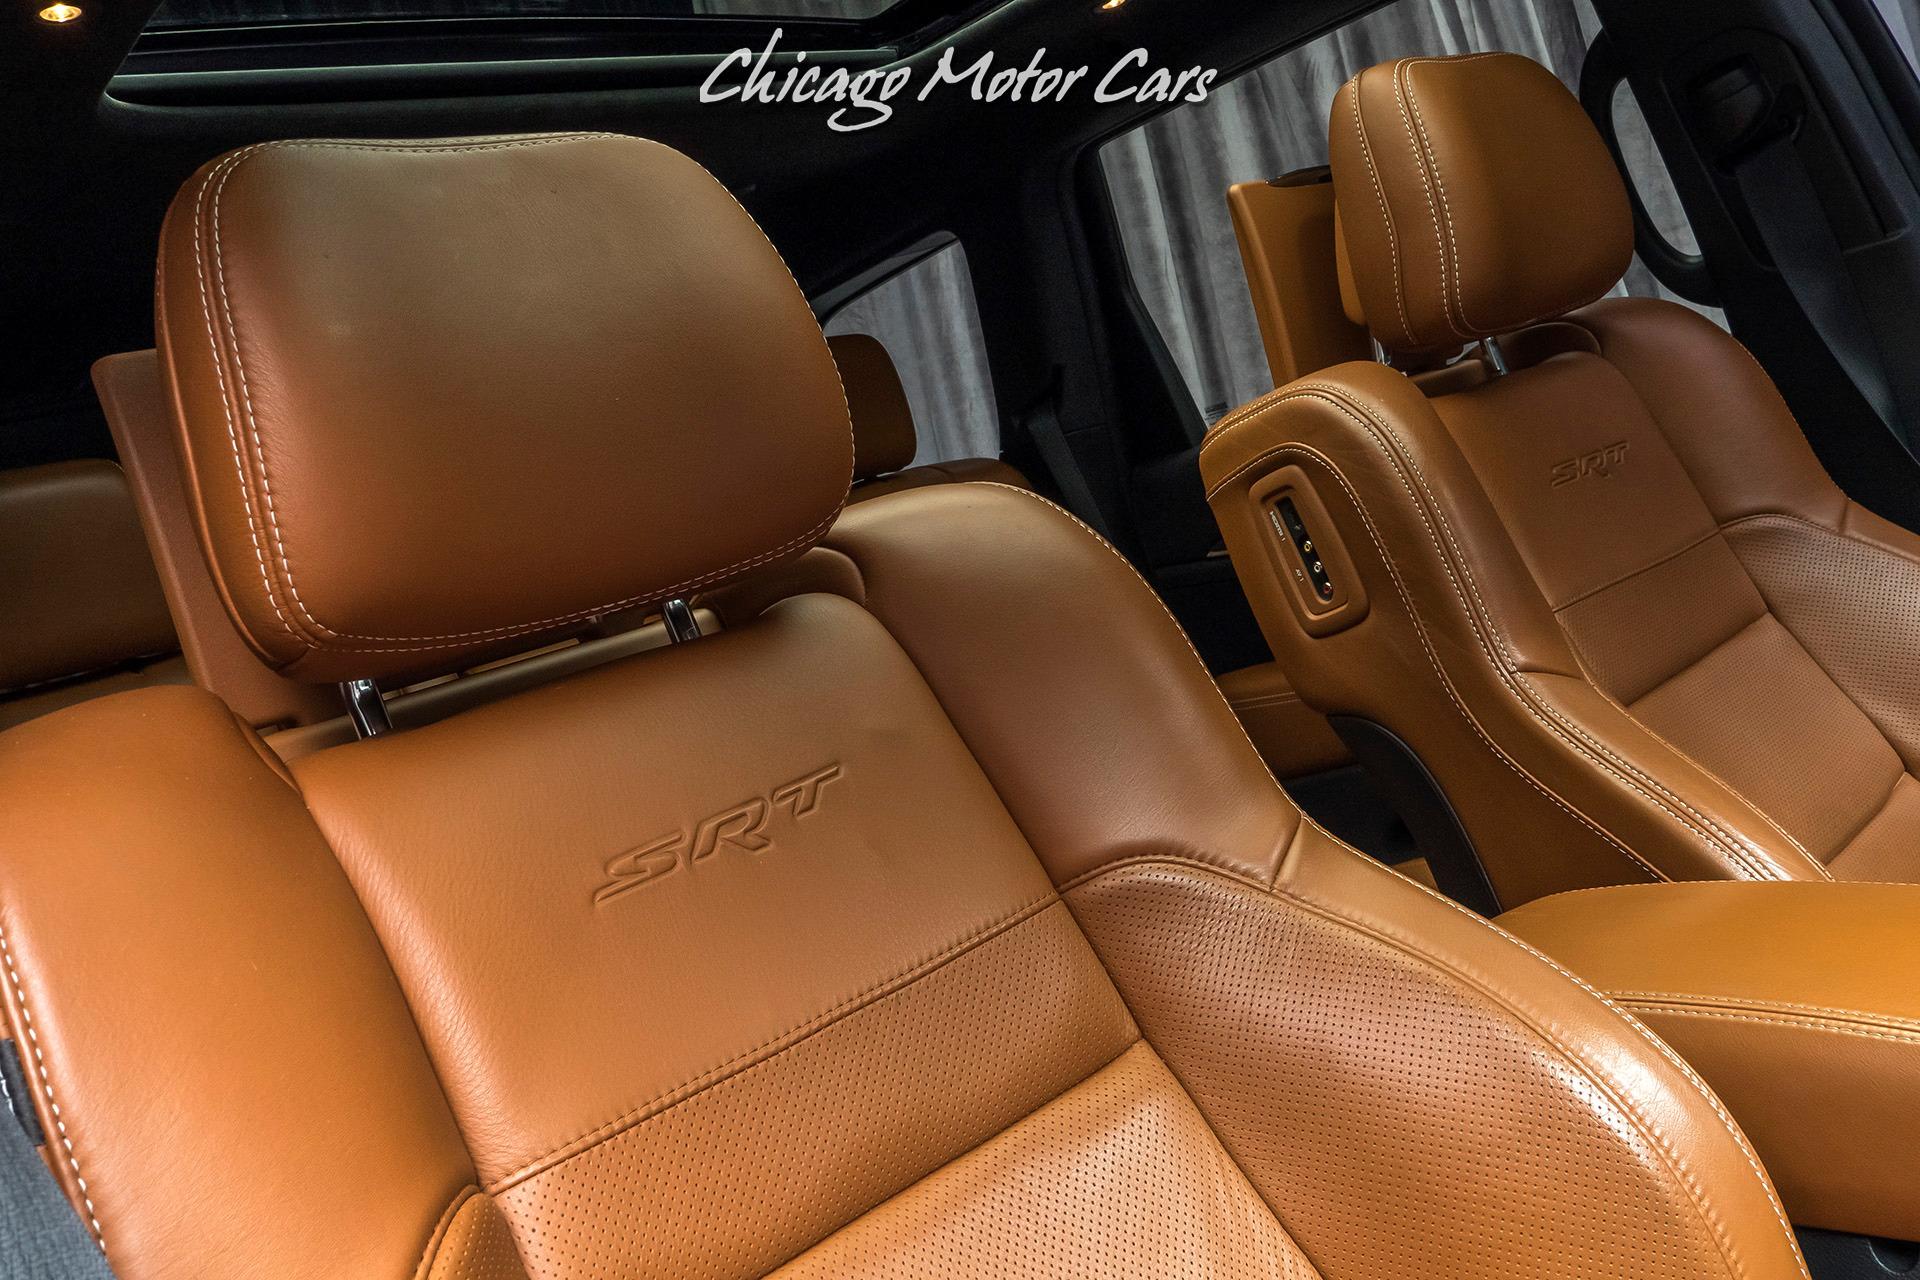 Used-2016-Jeep-Grand-Cherokee-SRT-4X4-SUV-LAGUNA-FULL-LEATHER-REAR-ENTERTAINMENT